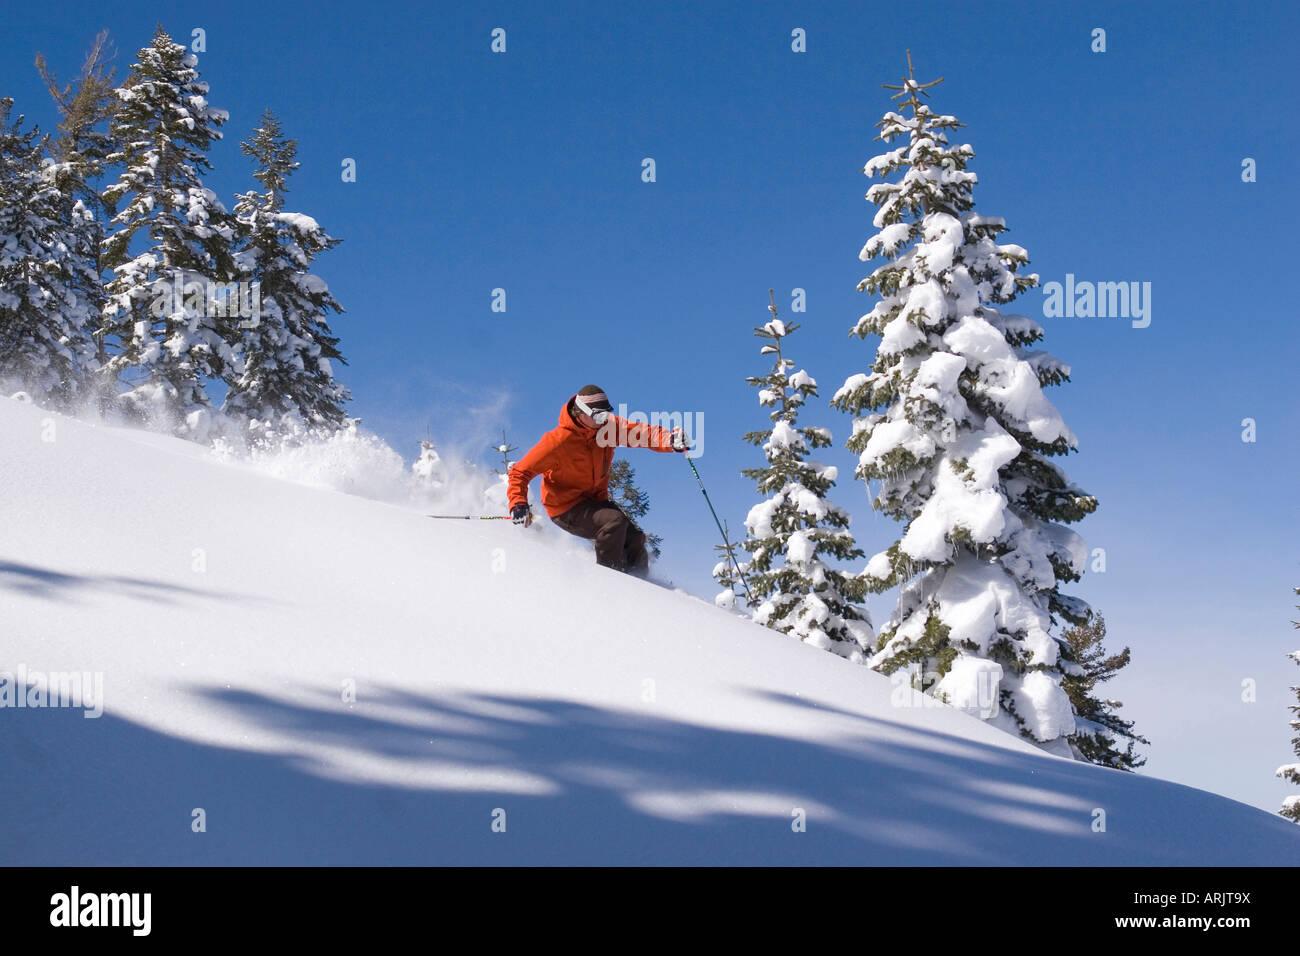 Side profile of a man skiing on snow, Lake Tahoe, California, USA Stock Photo